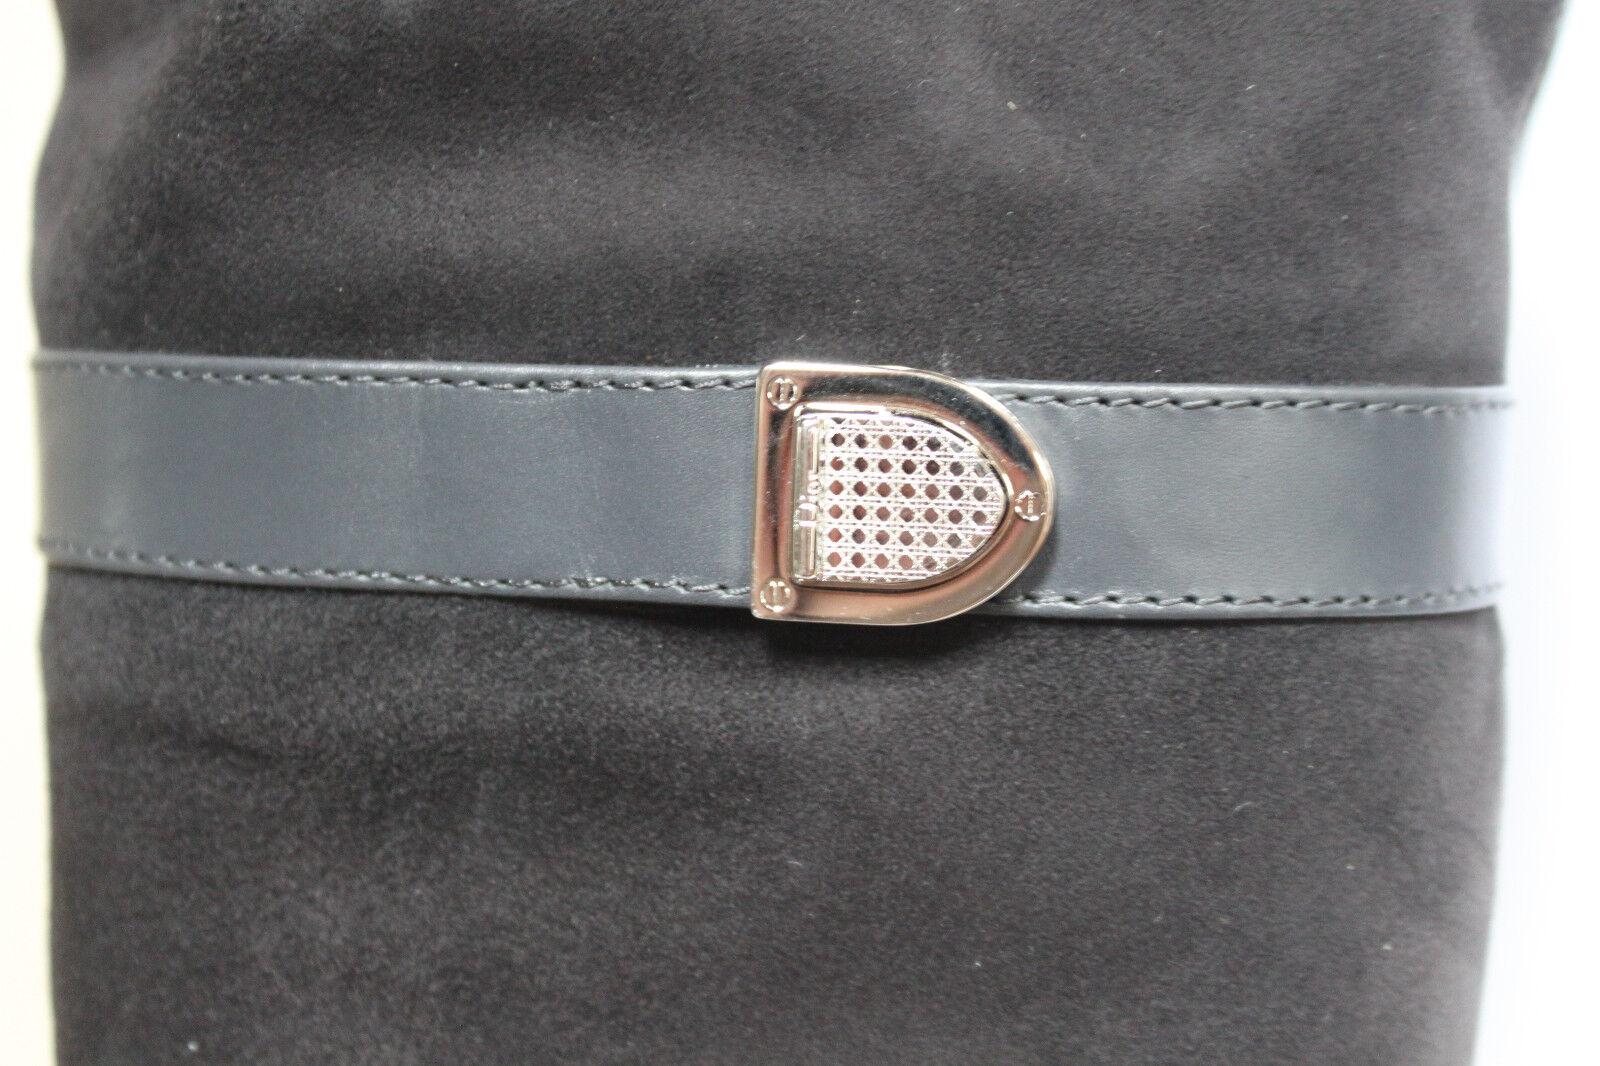 Nuevo 6.5 36.5 Christian Dior gris del Gamuza brodés alto Plana Zapatos bota de alto del gris muslo 1f5ccb